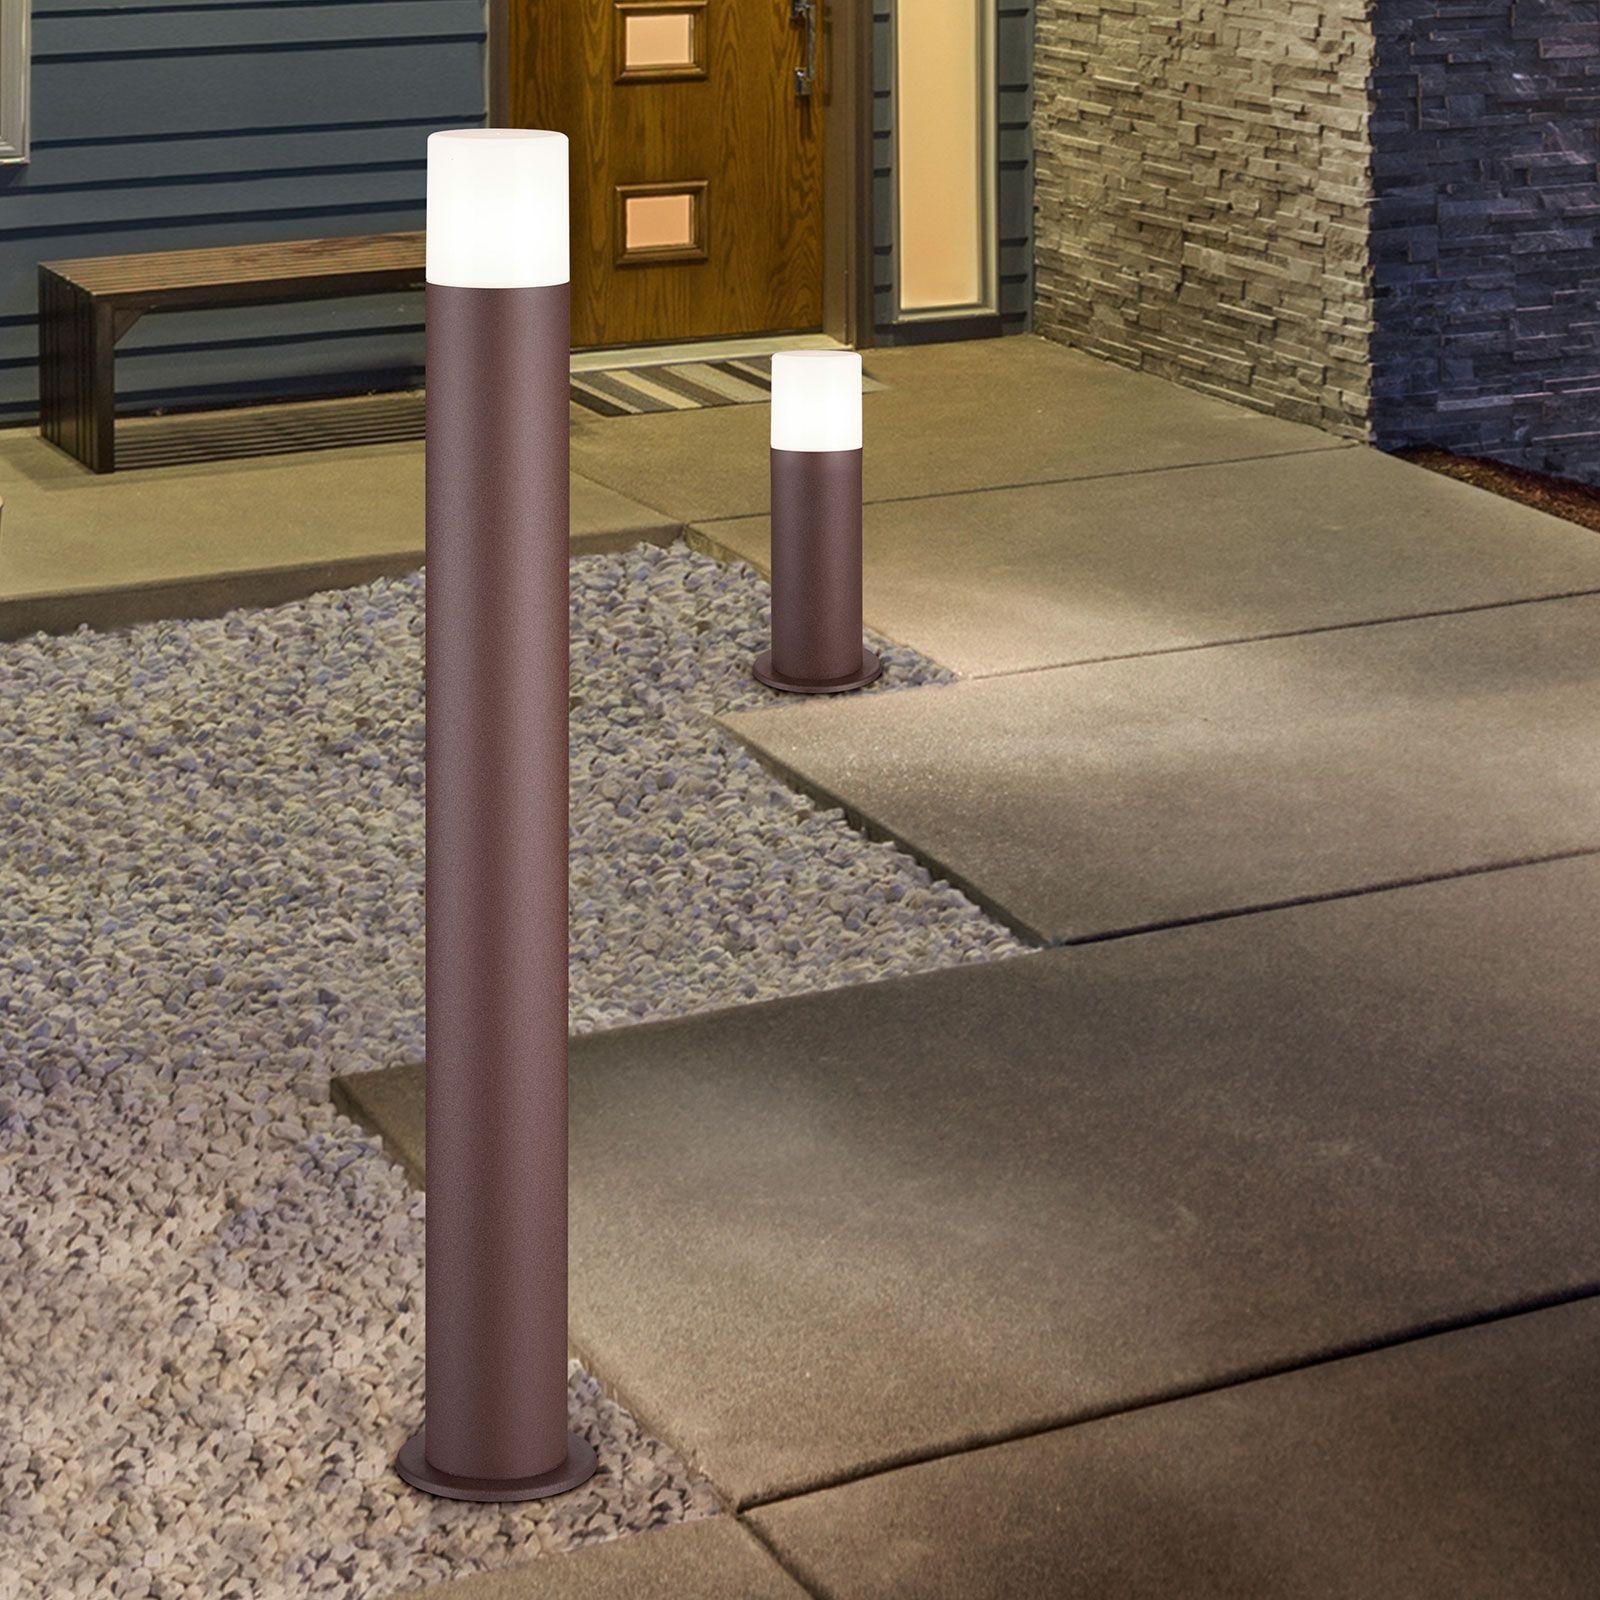 Hoosic gadelampe af trykstøbt aluminium rustfarvet